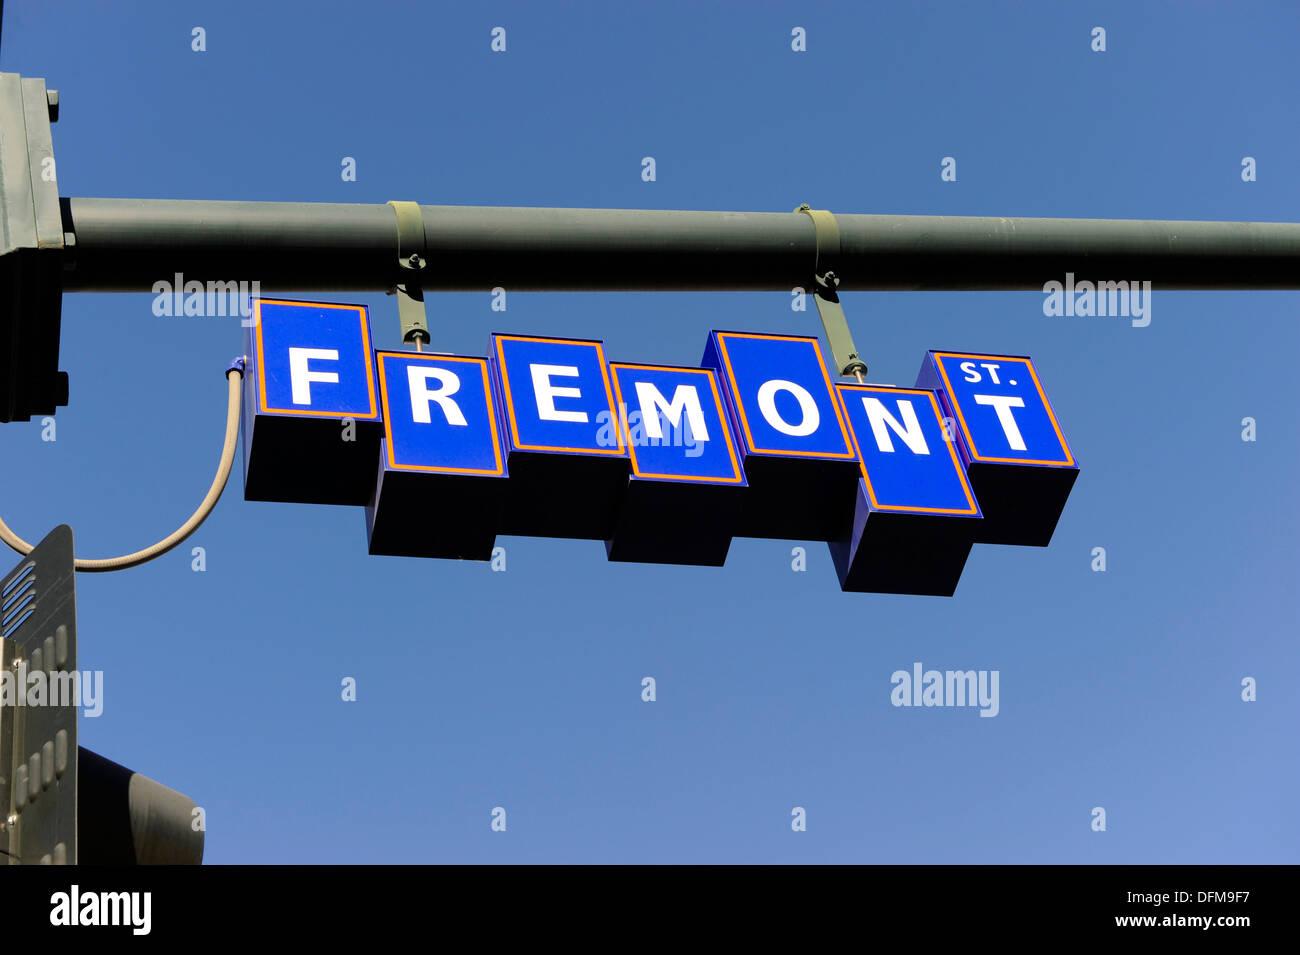 Fremont District Las Vegas Nevada vintage retro - Stock Image